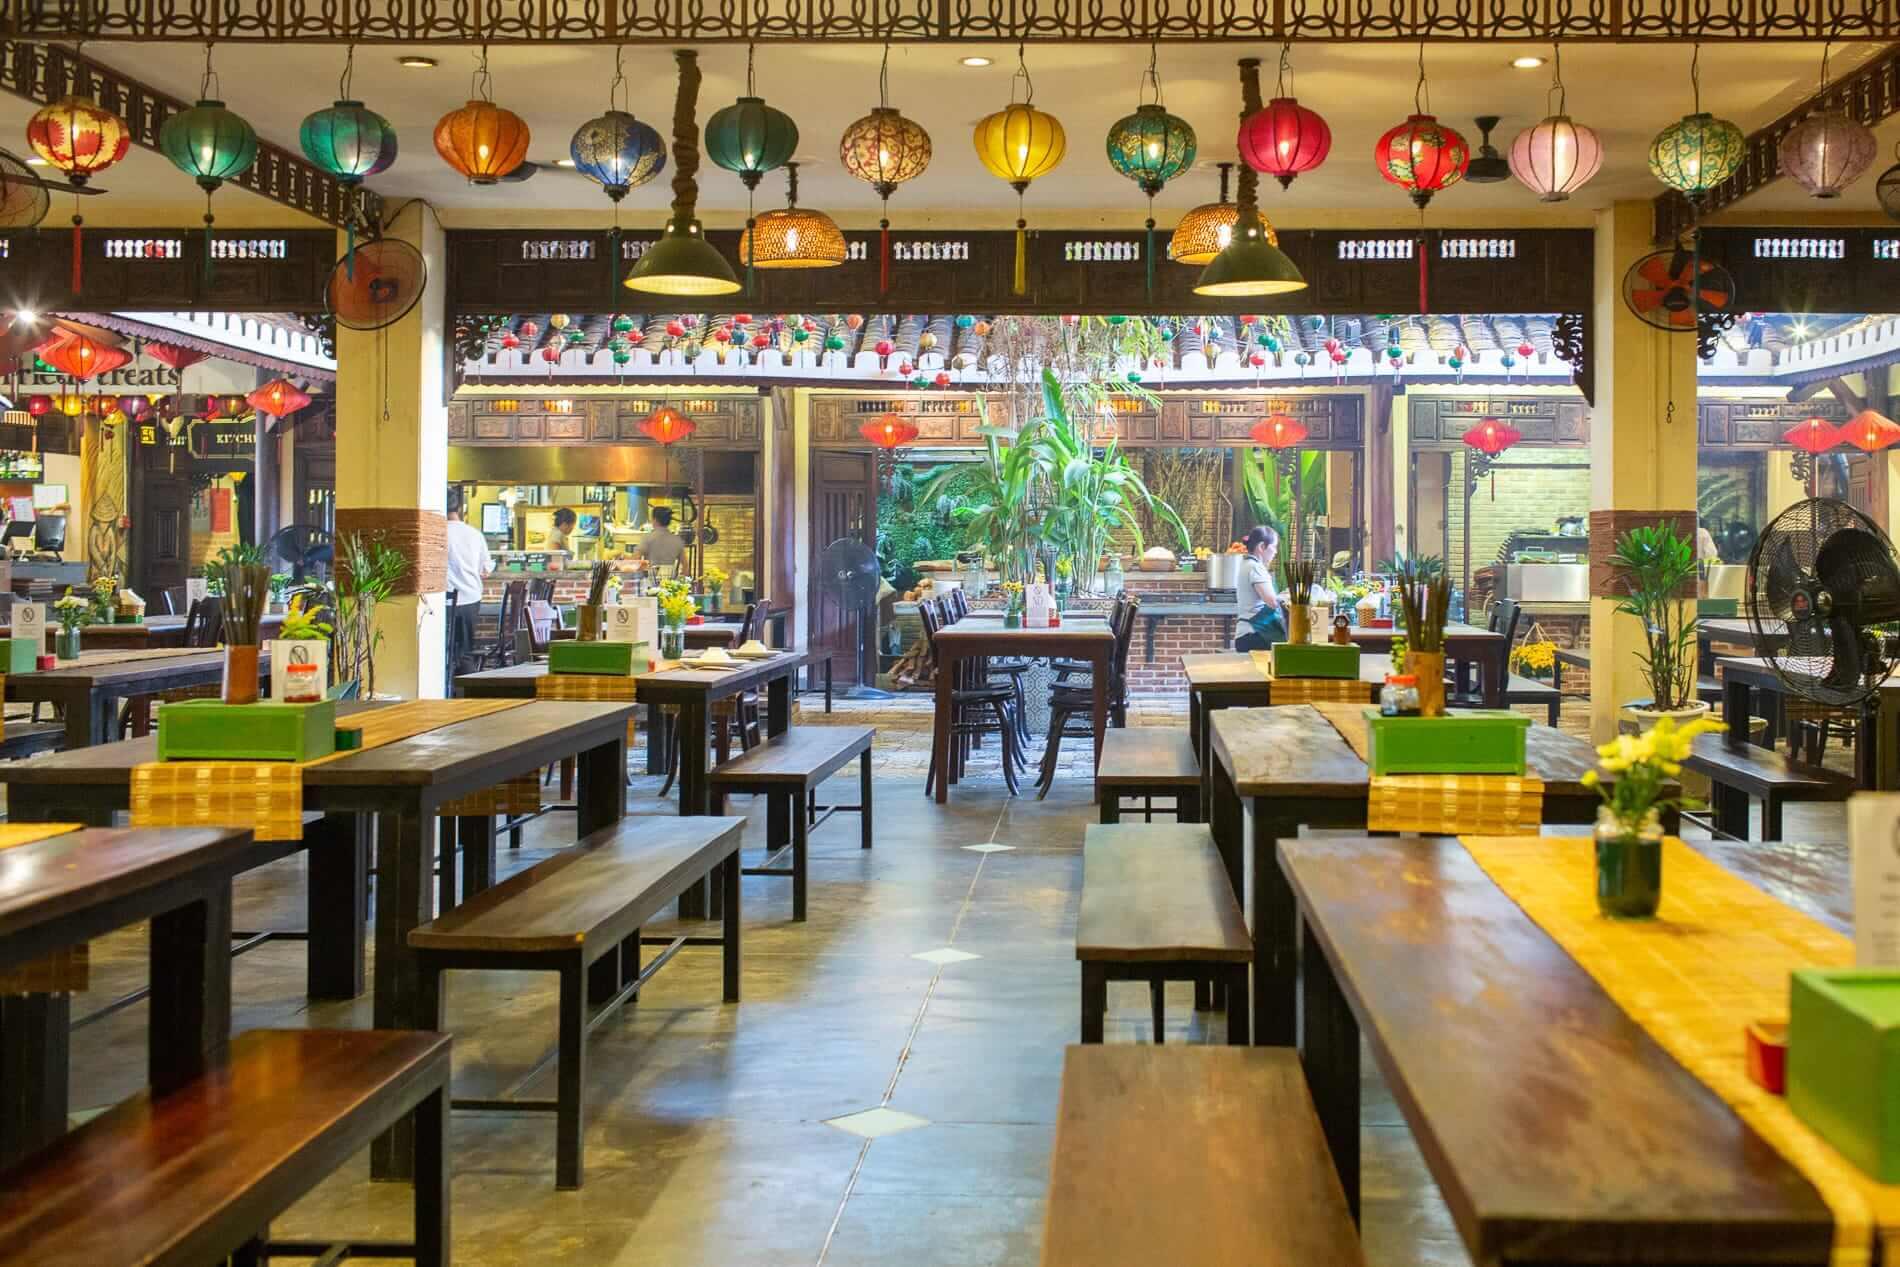 Hoi An Restaurant Vy's Marketplace